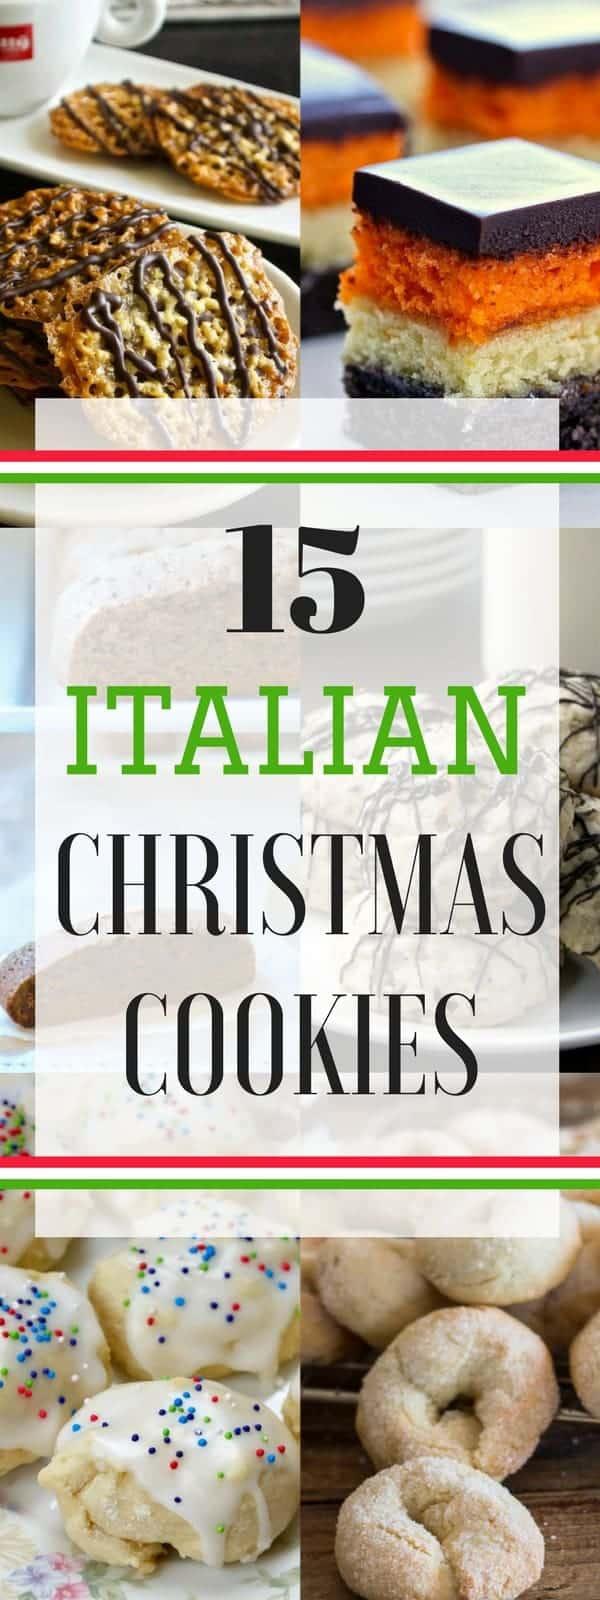 Italian Christmas Cookies - Snappy Gourmet